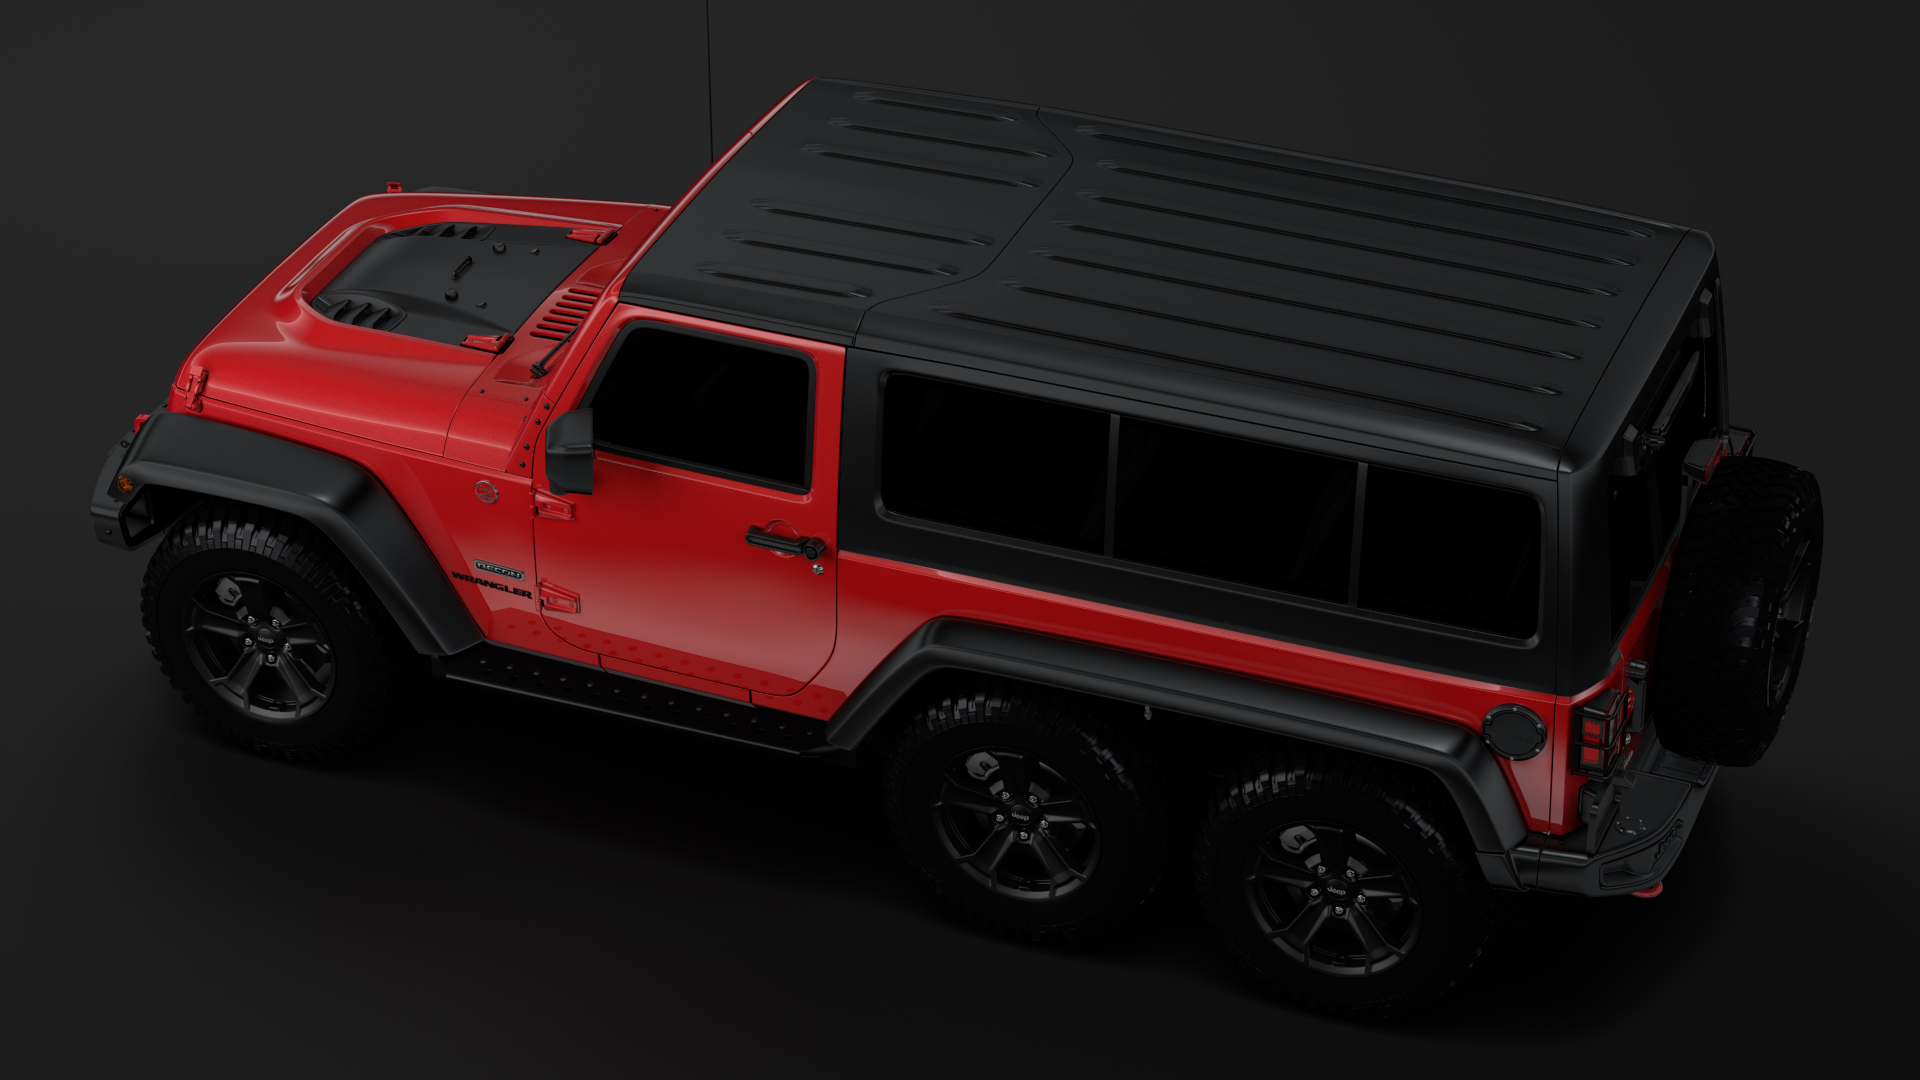 jeep wrangler 6×6 rubicon recon jk 2017 3d model max fbx c4d lwo ma mb hrc xsi obj 276851